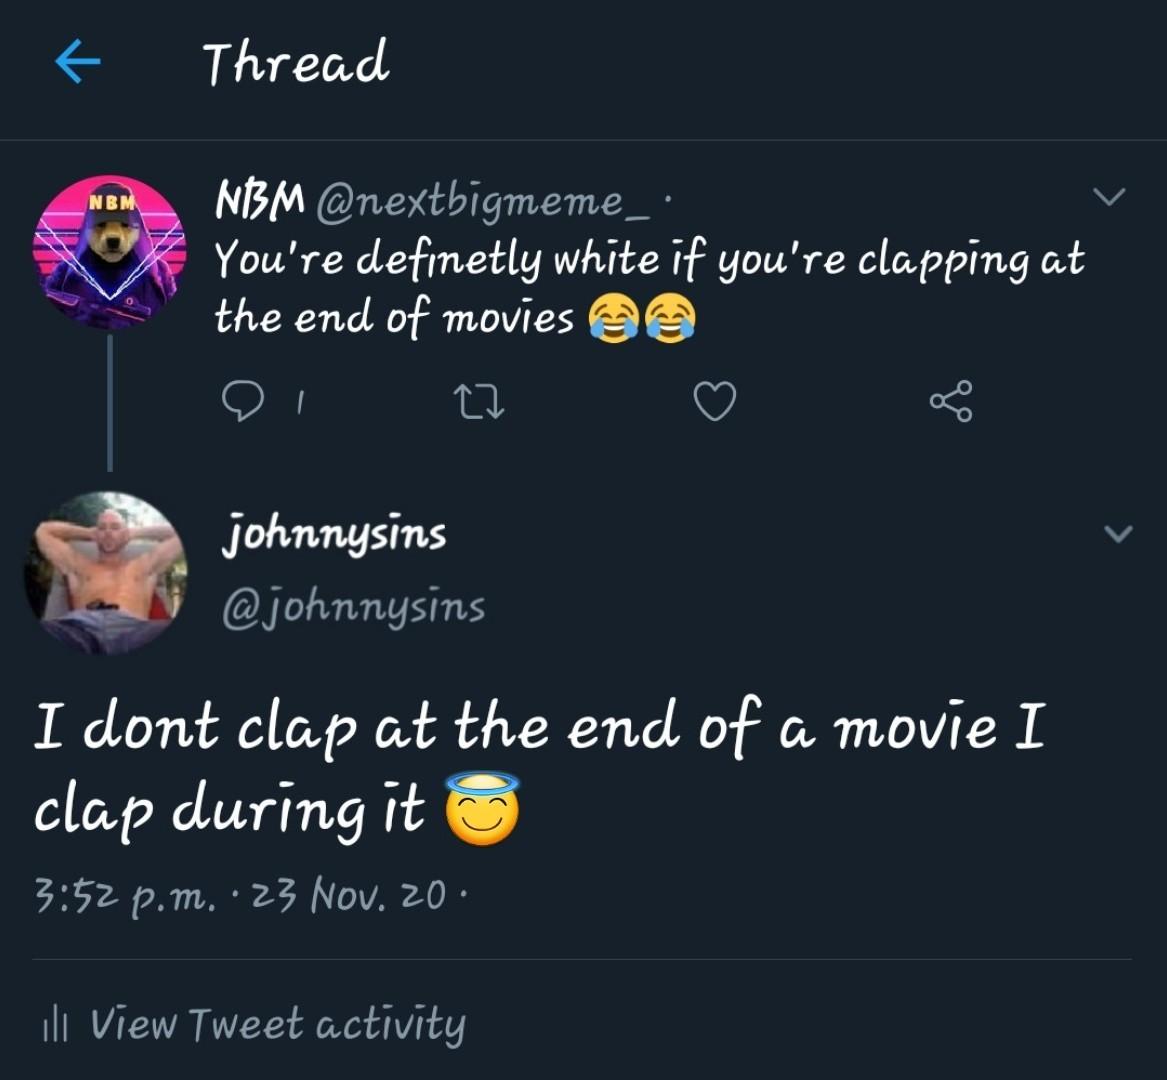 Johnny sins be wilding - meme